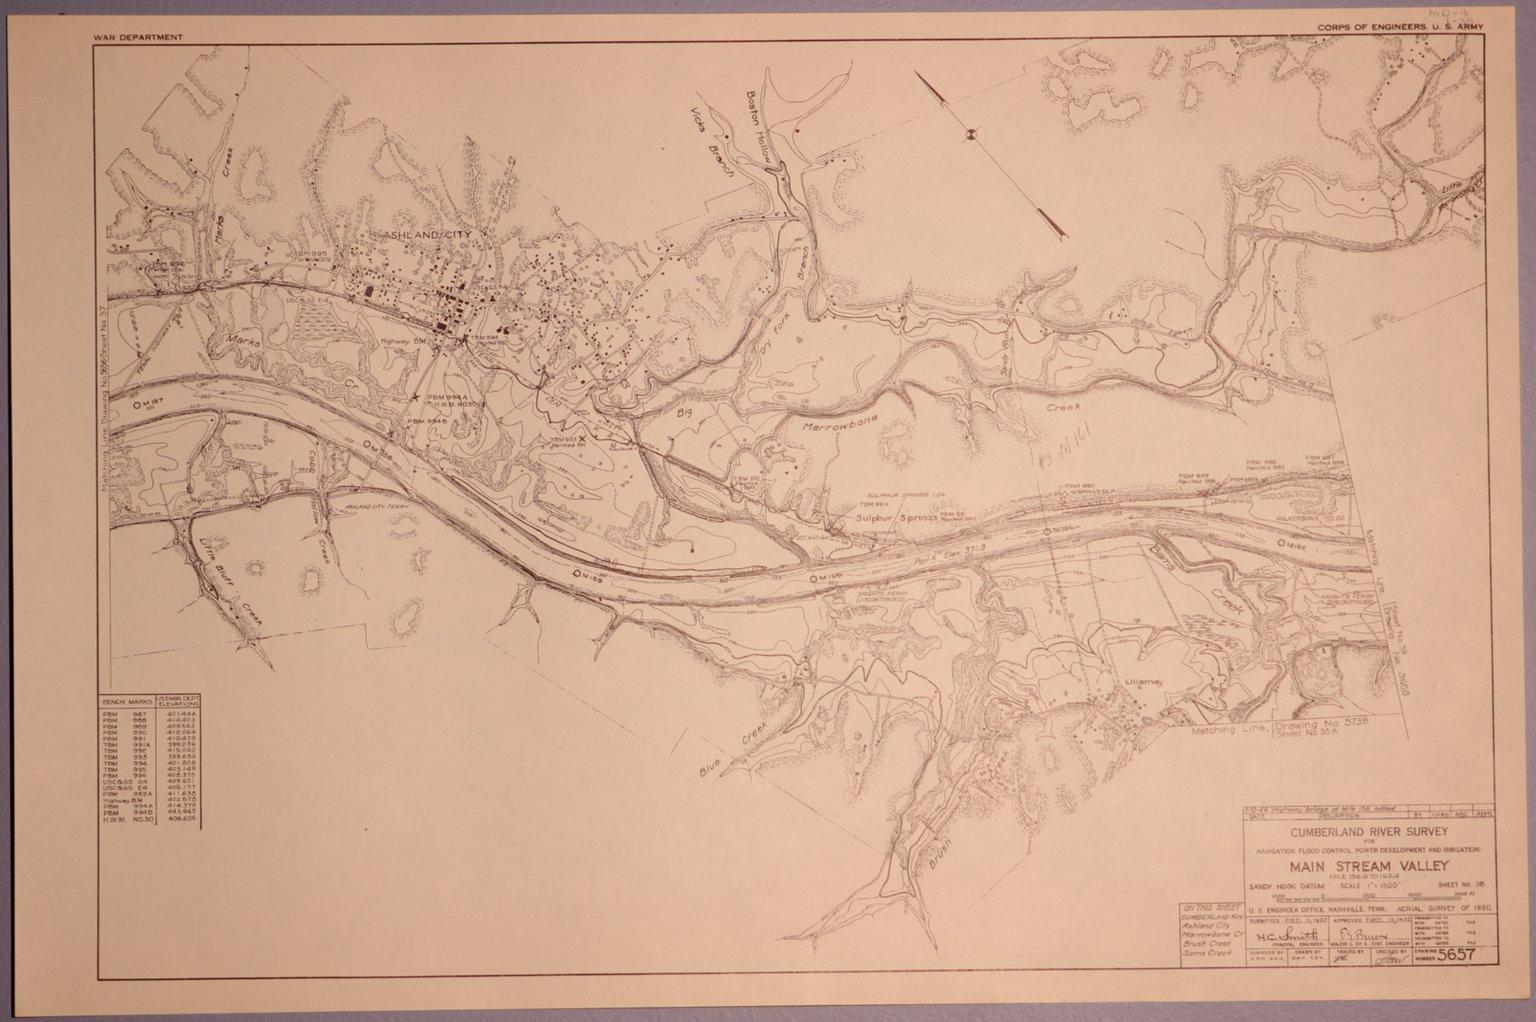 Cumberland River Survey 5657